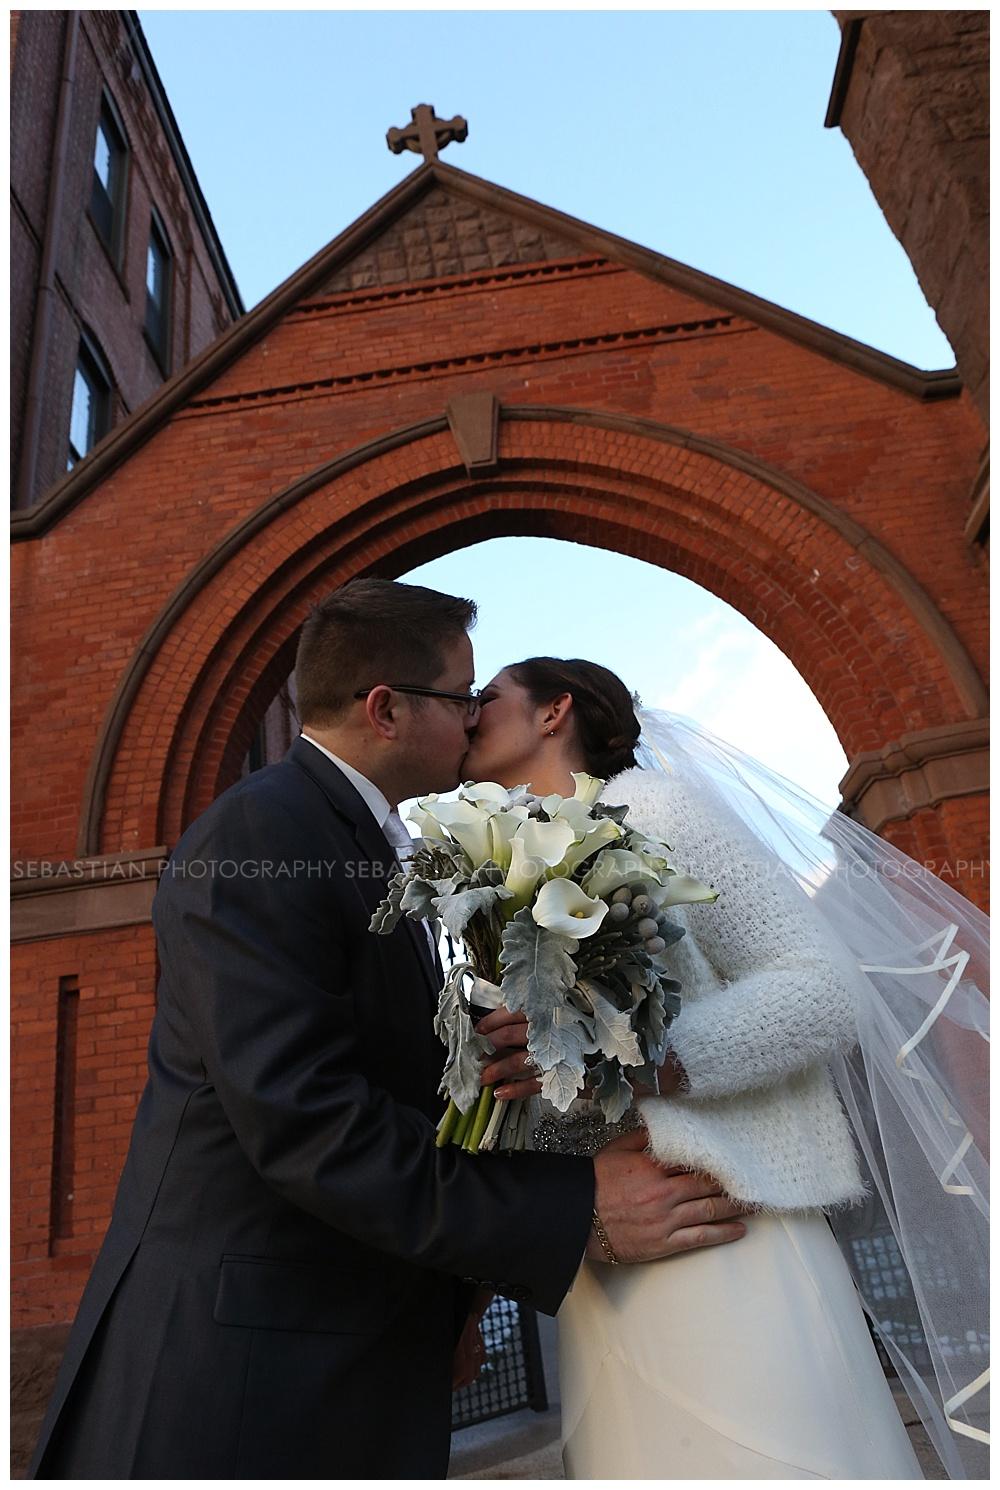 Sebastian_Photography_Wedding_SaybrookPointInn_Shore21.jpg